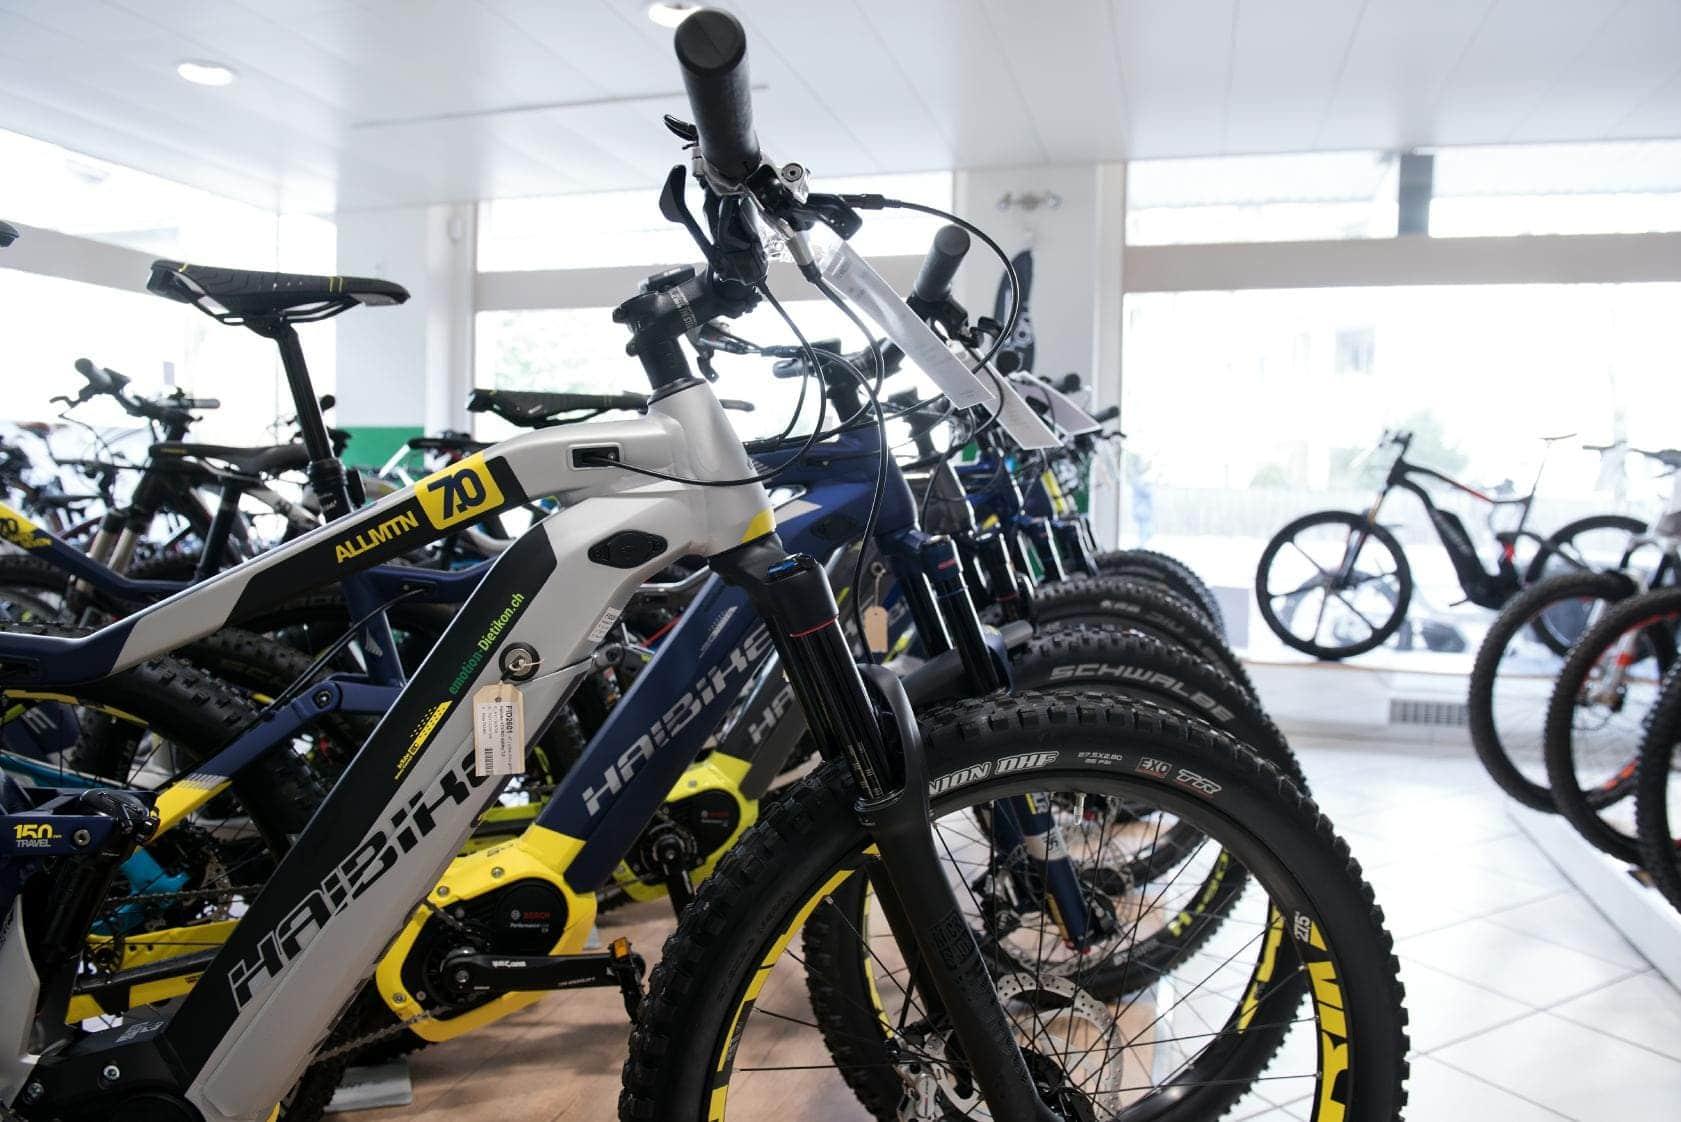 e-motion e-Bike Welt Dietikon_Shop_2018_13_e-Mountainbike_Haibike_Verkauf_hintereinander